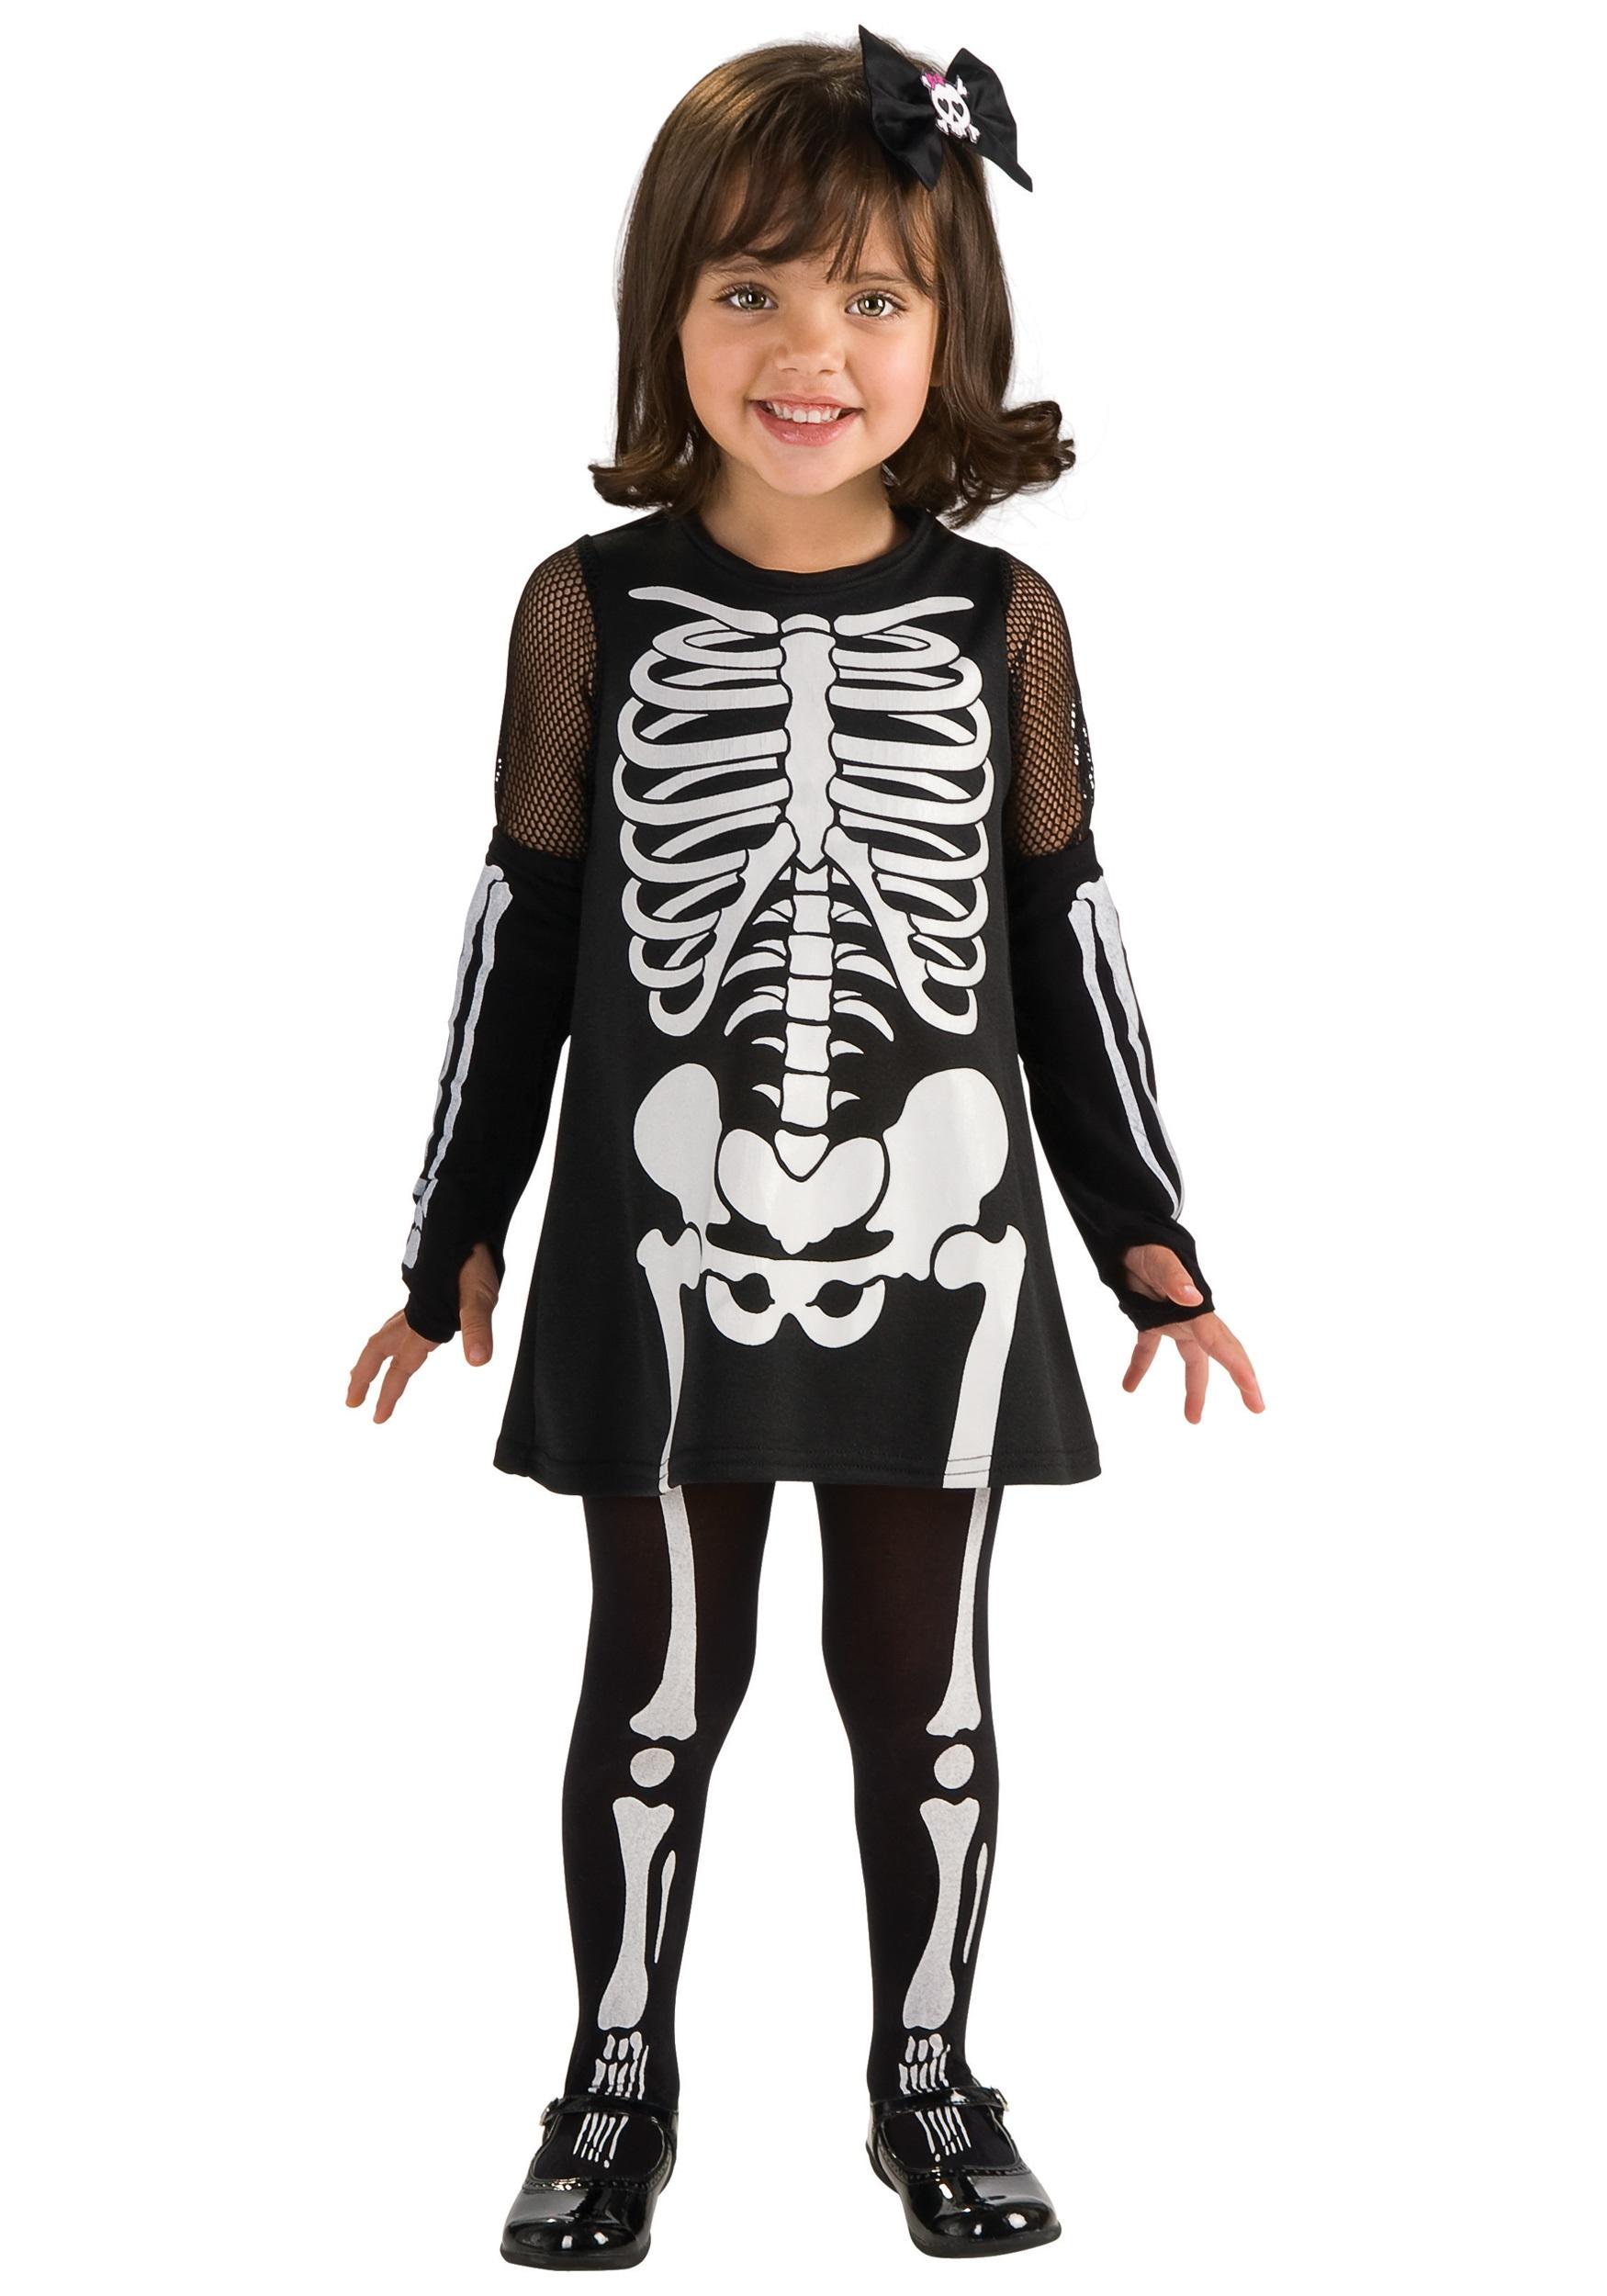 Halloween Skeleton Costume Kids.Toddler Skeleton Dress